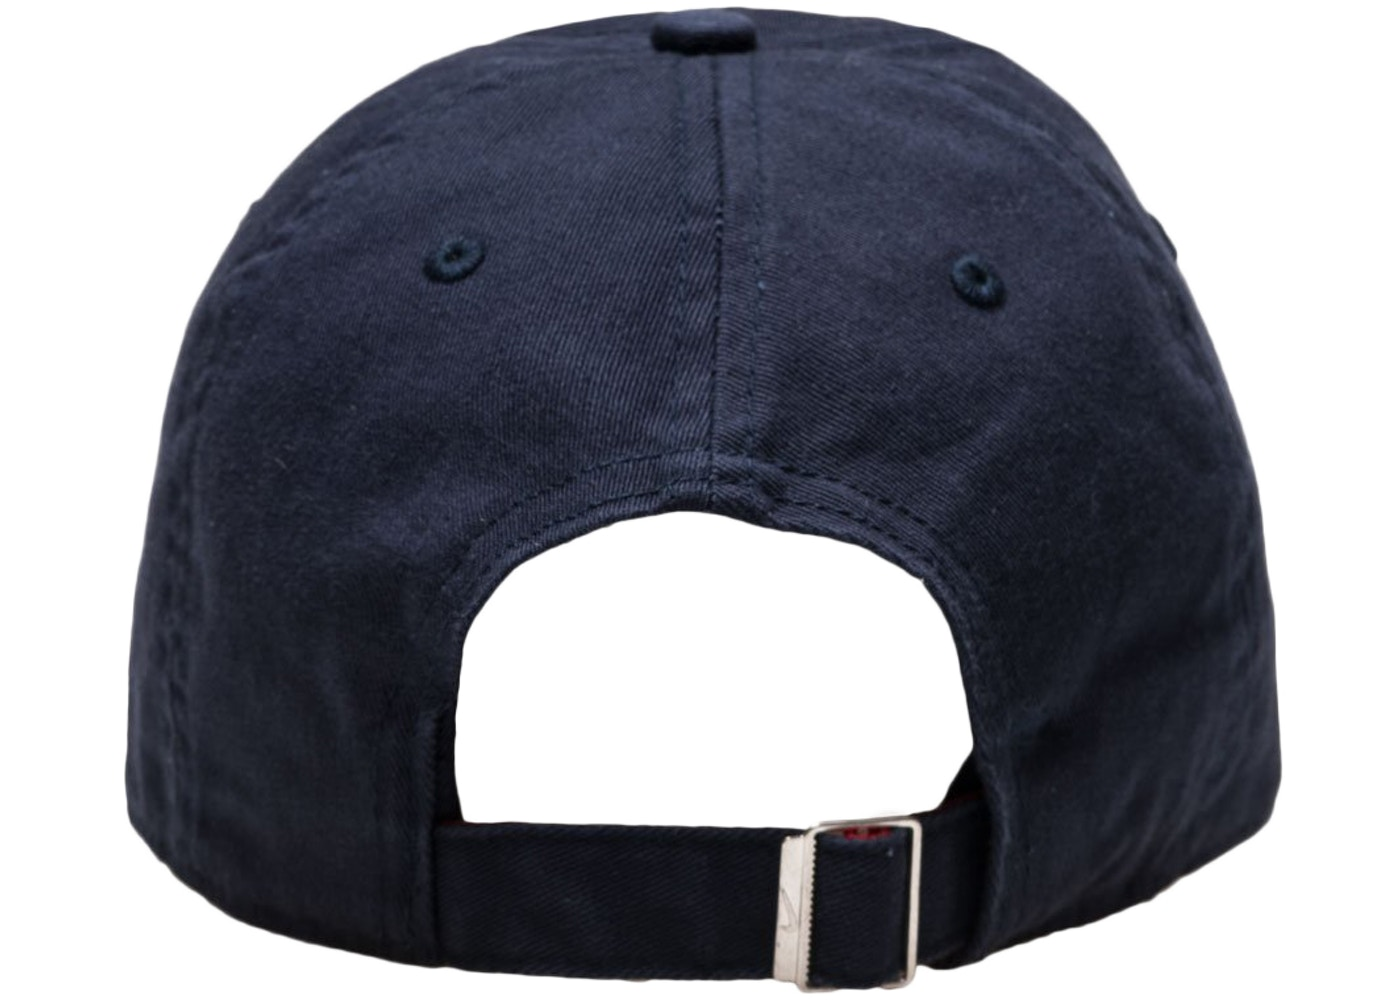 e39c8e4ab7094 Streetwear - Kith Headwear - Volatility